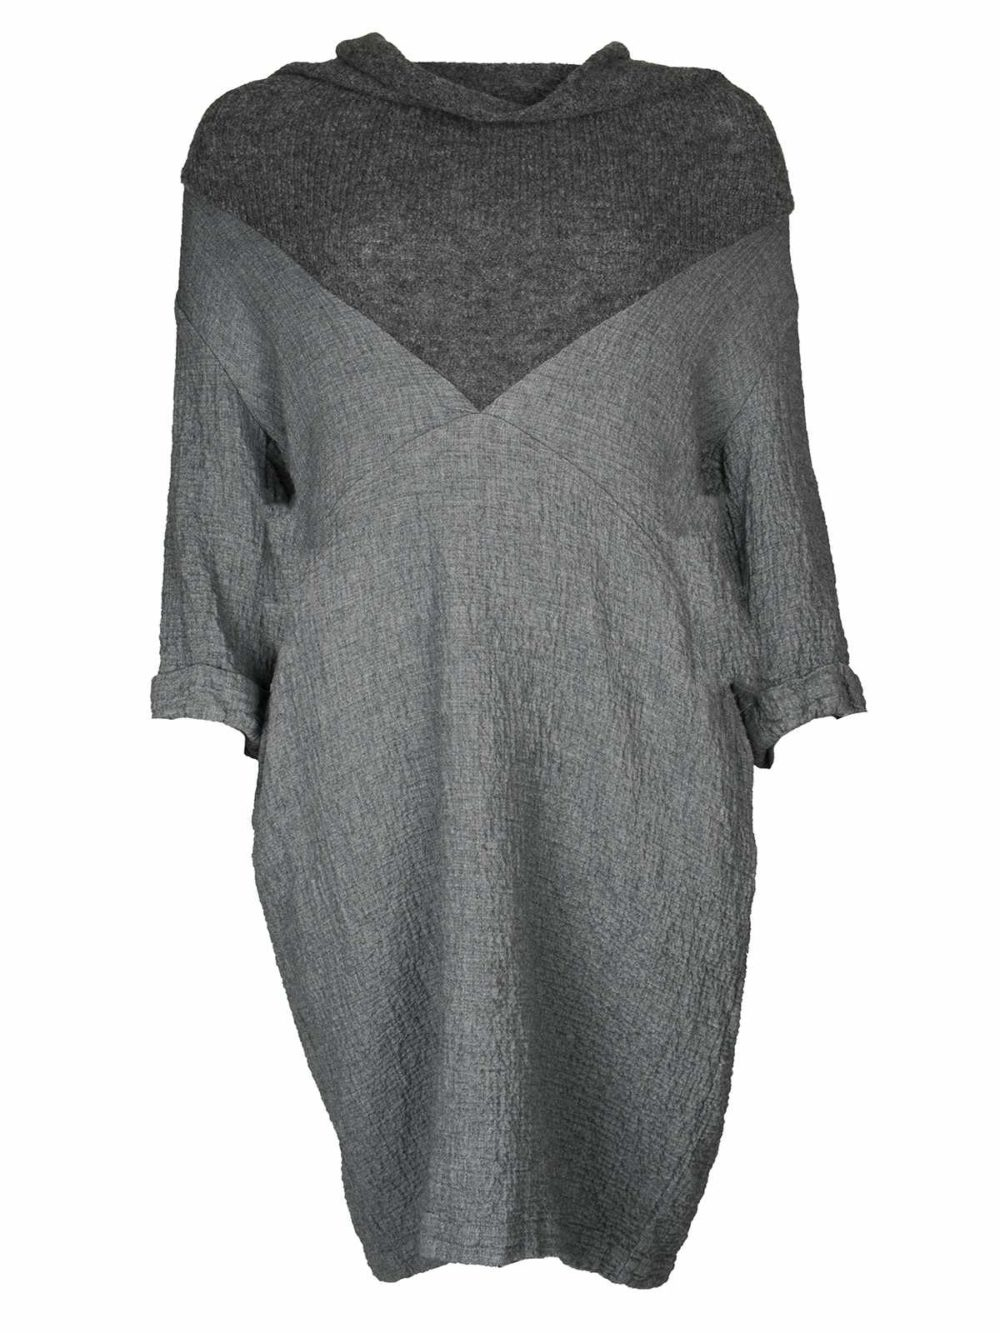 Dress 91064 Grizas Katie Kerr Women's Clothing